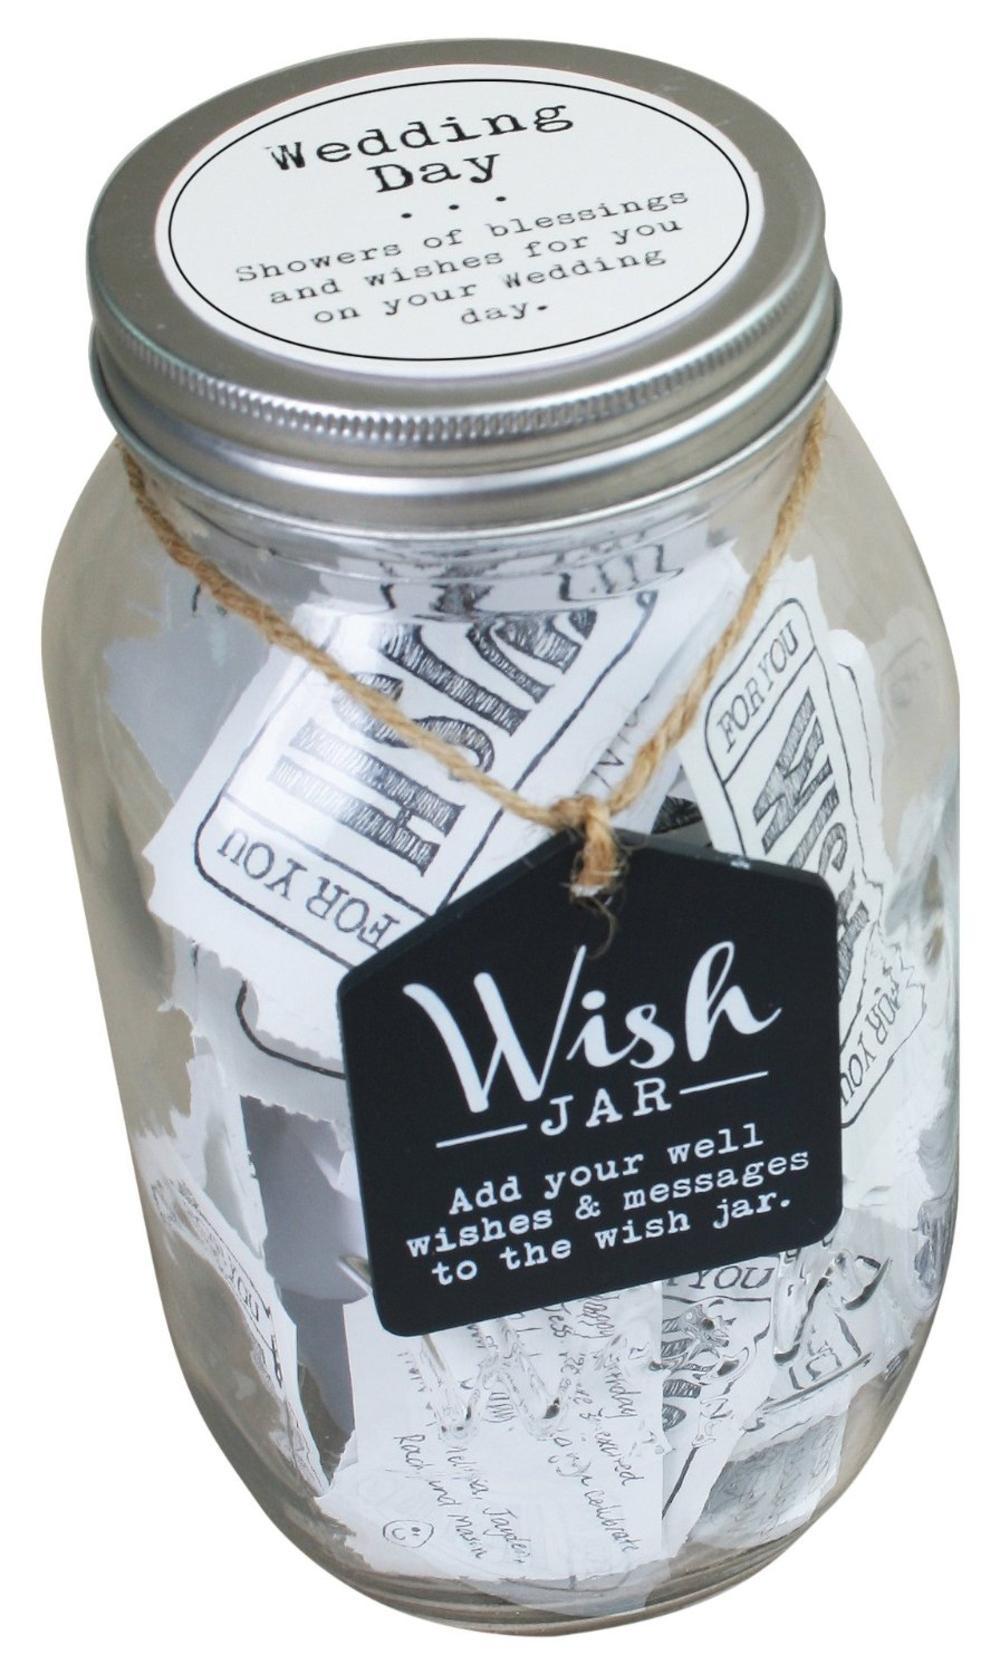 Splosh Wedding Wish Jar Gift Idea | Gifts